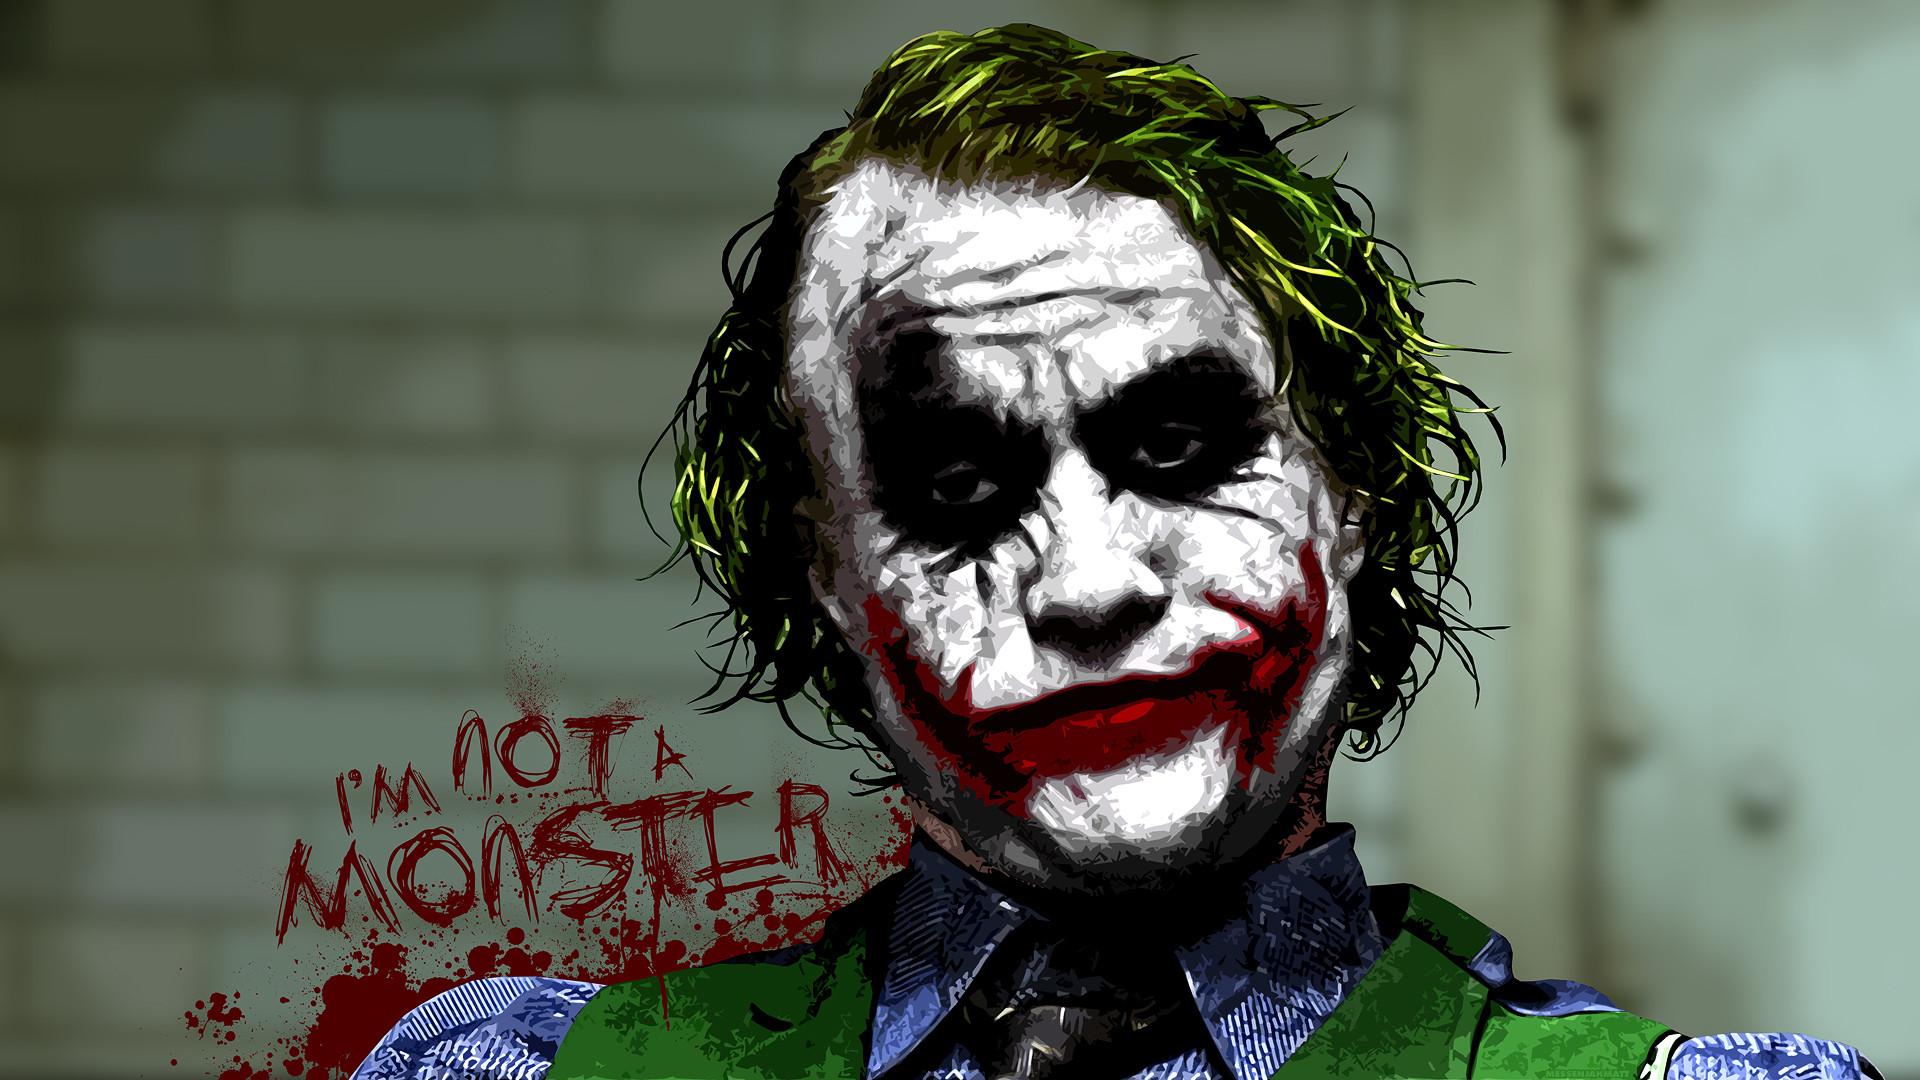 Amazing Joker Wallpaper HD #10390 Wallpaper | Wallpaper Screen .